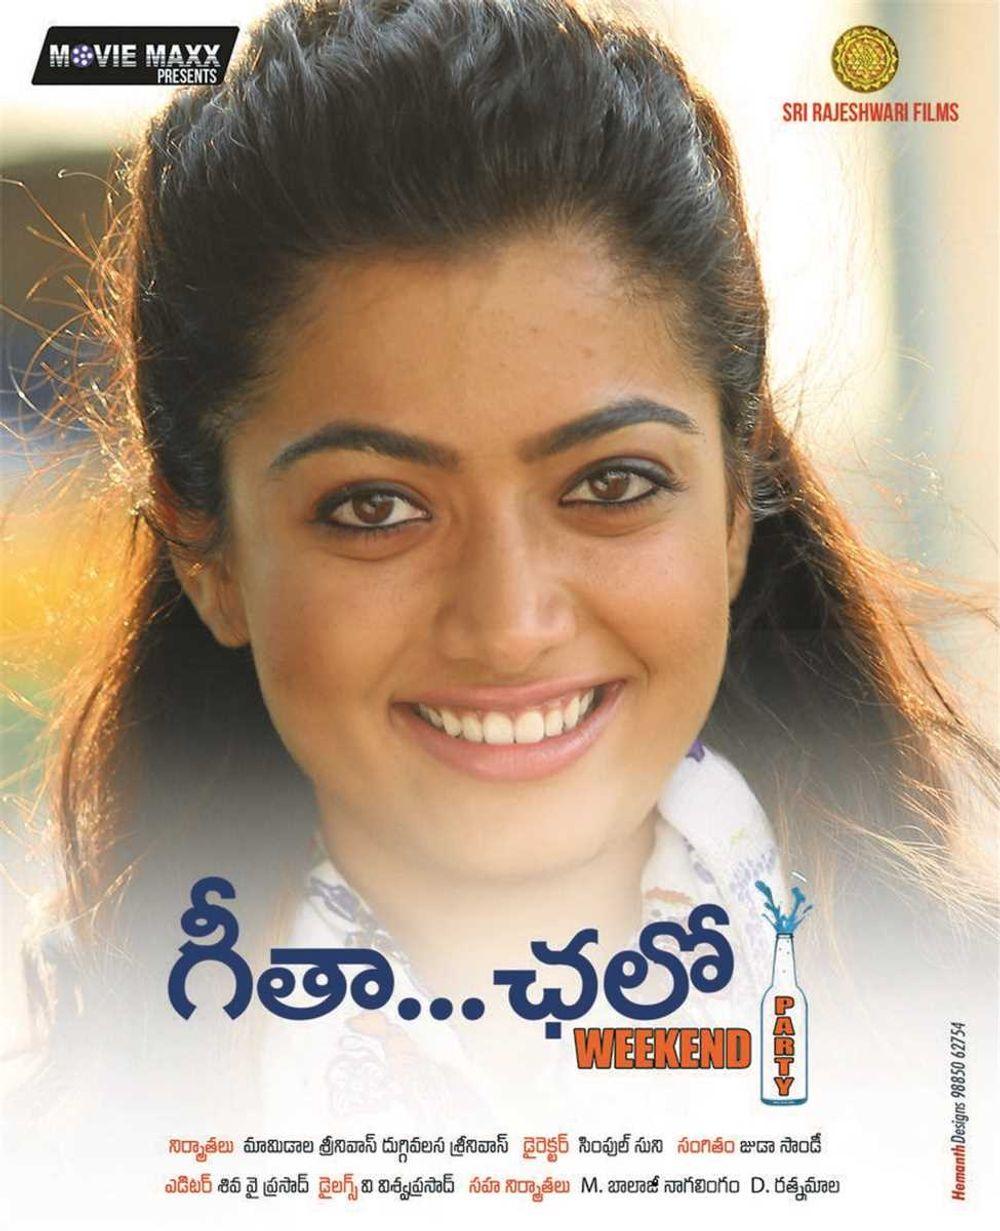 4-Geetha Chalo